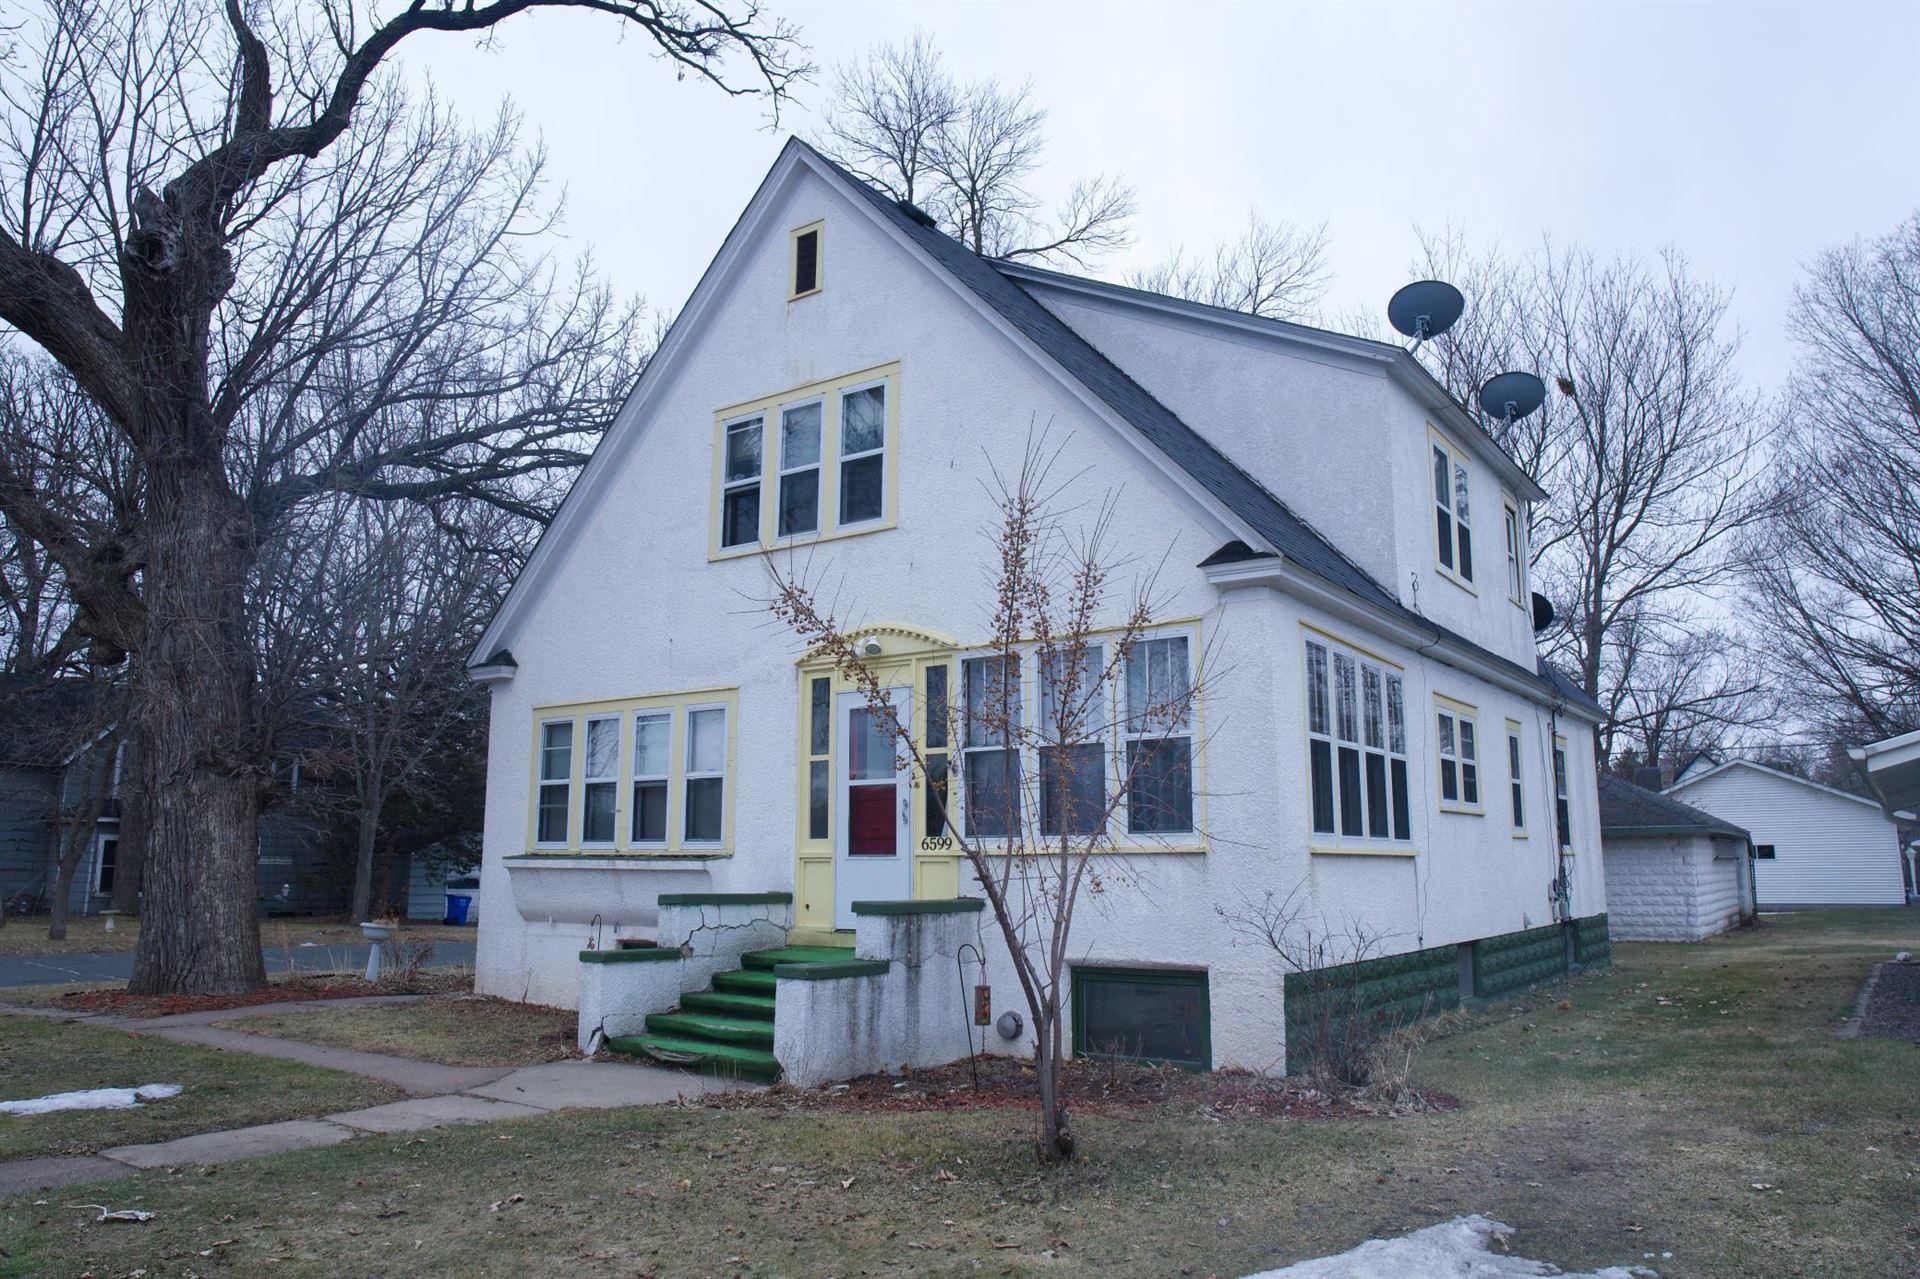 Photo of 6599 Main Street, North Branch, MN 55056 (MLS # 5727920)